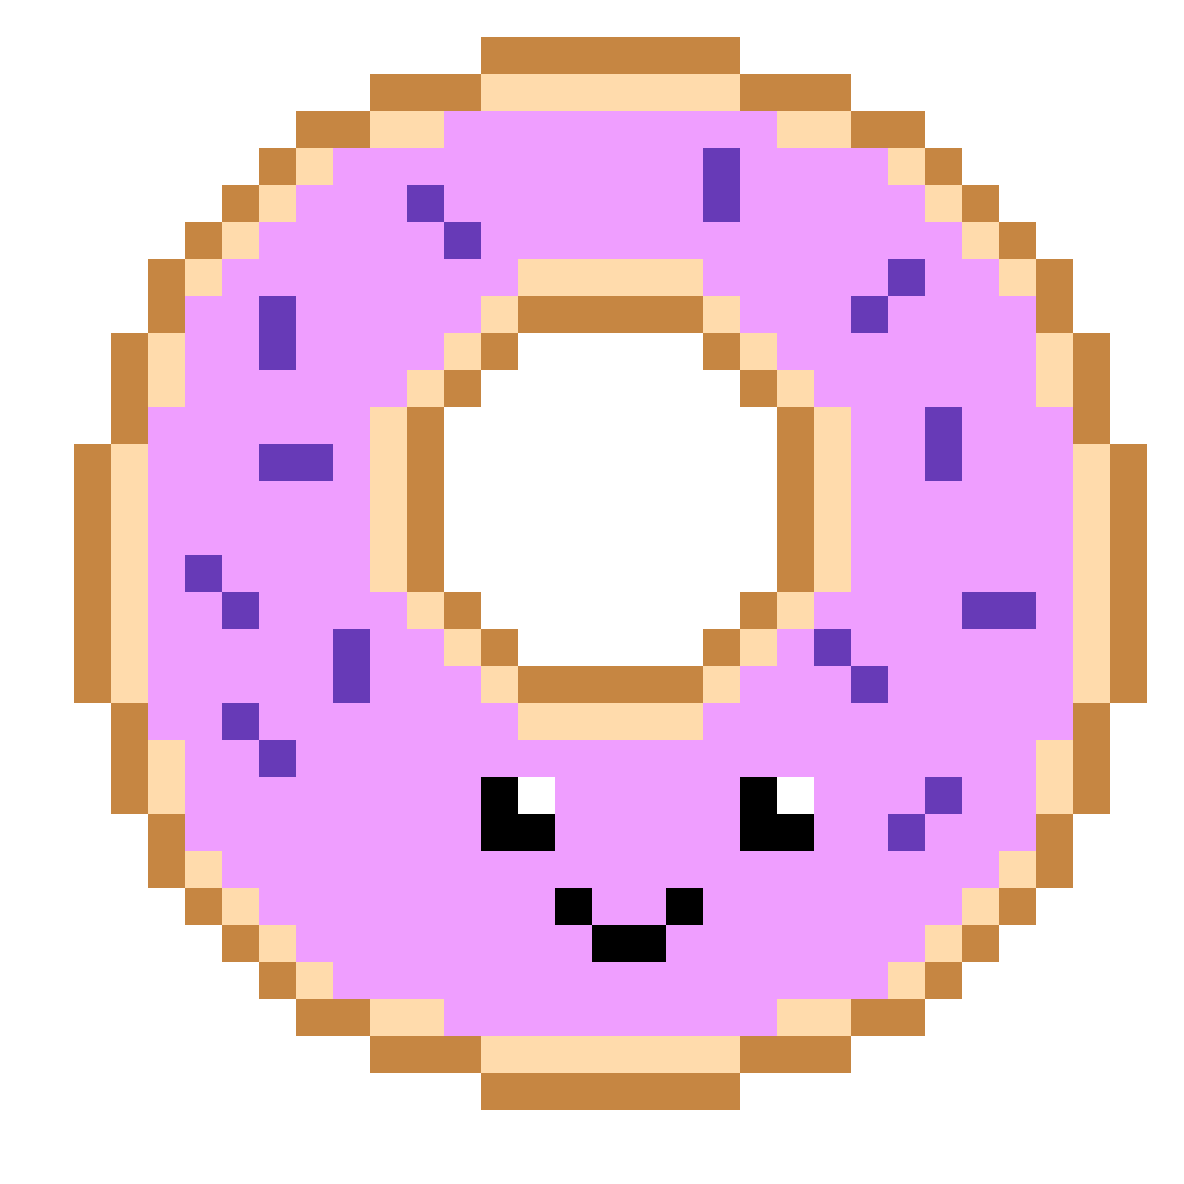 Donut by LittlePixil